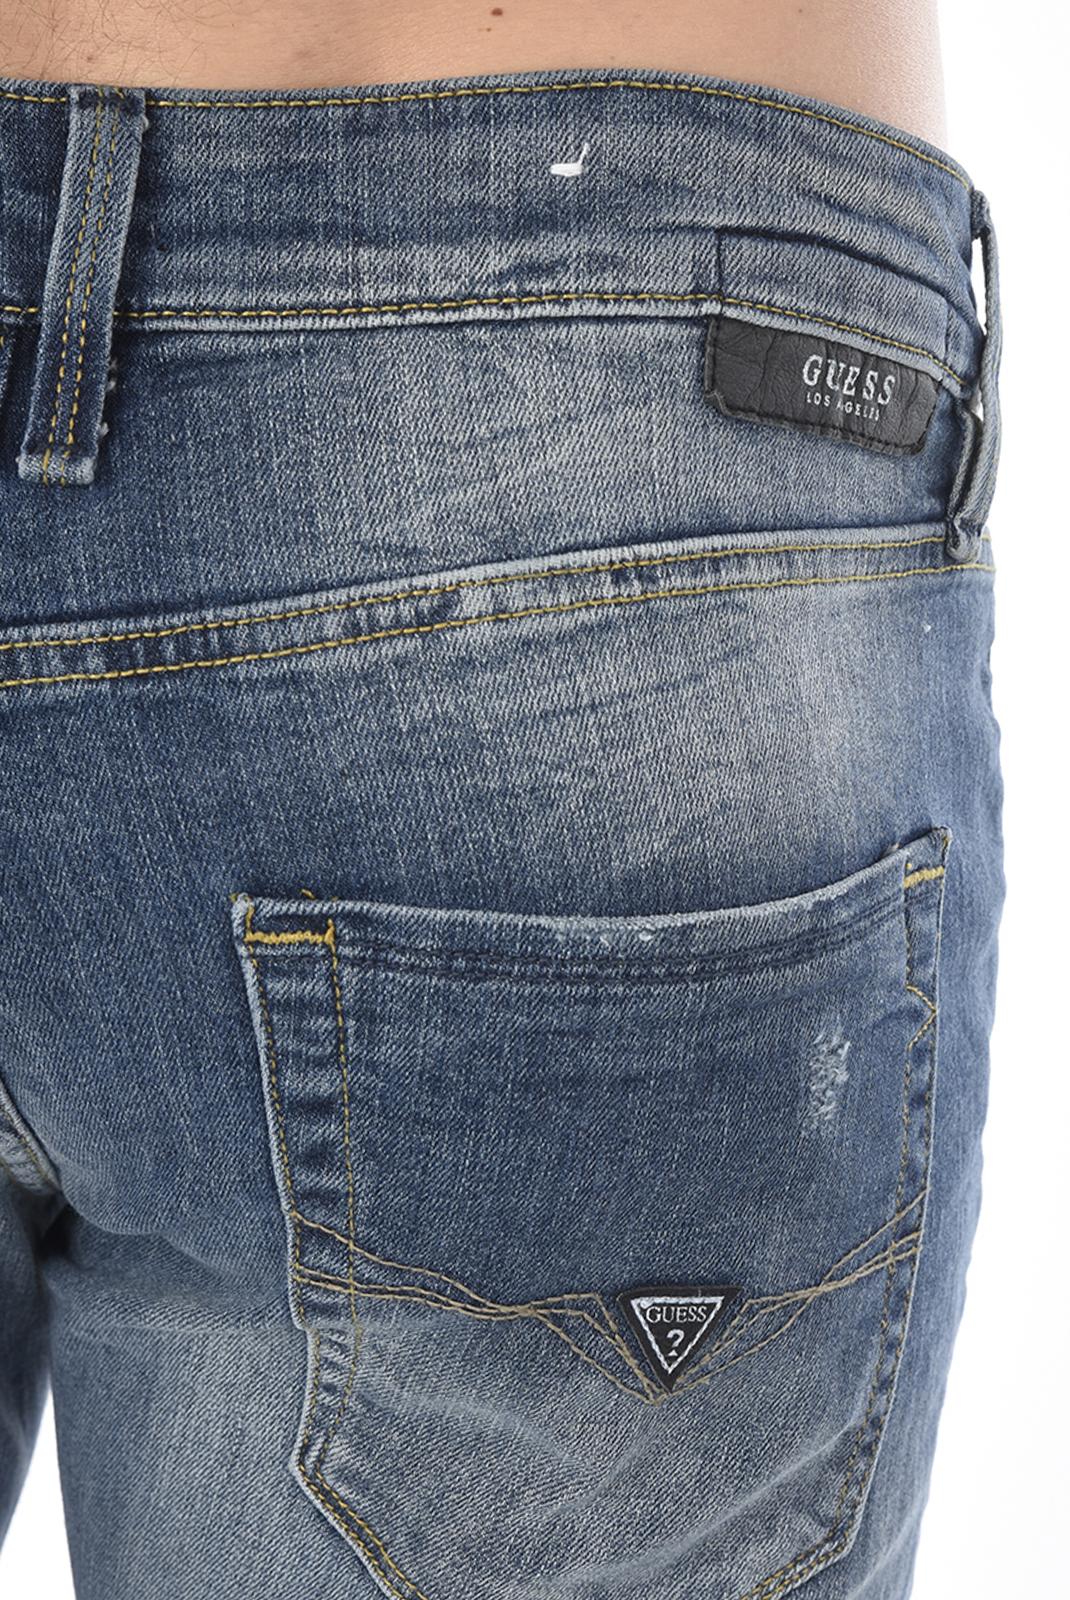 slim / skinny  Guess jeans M64AS3 D2CT8 LVLK